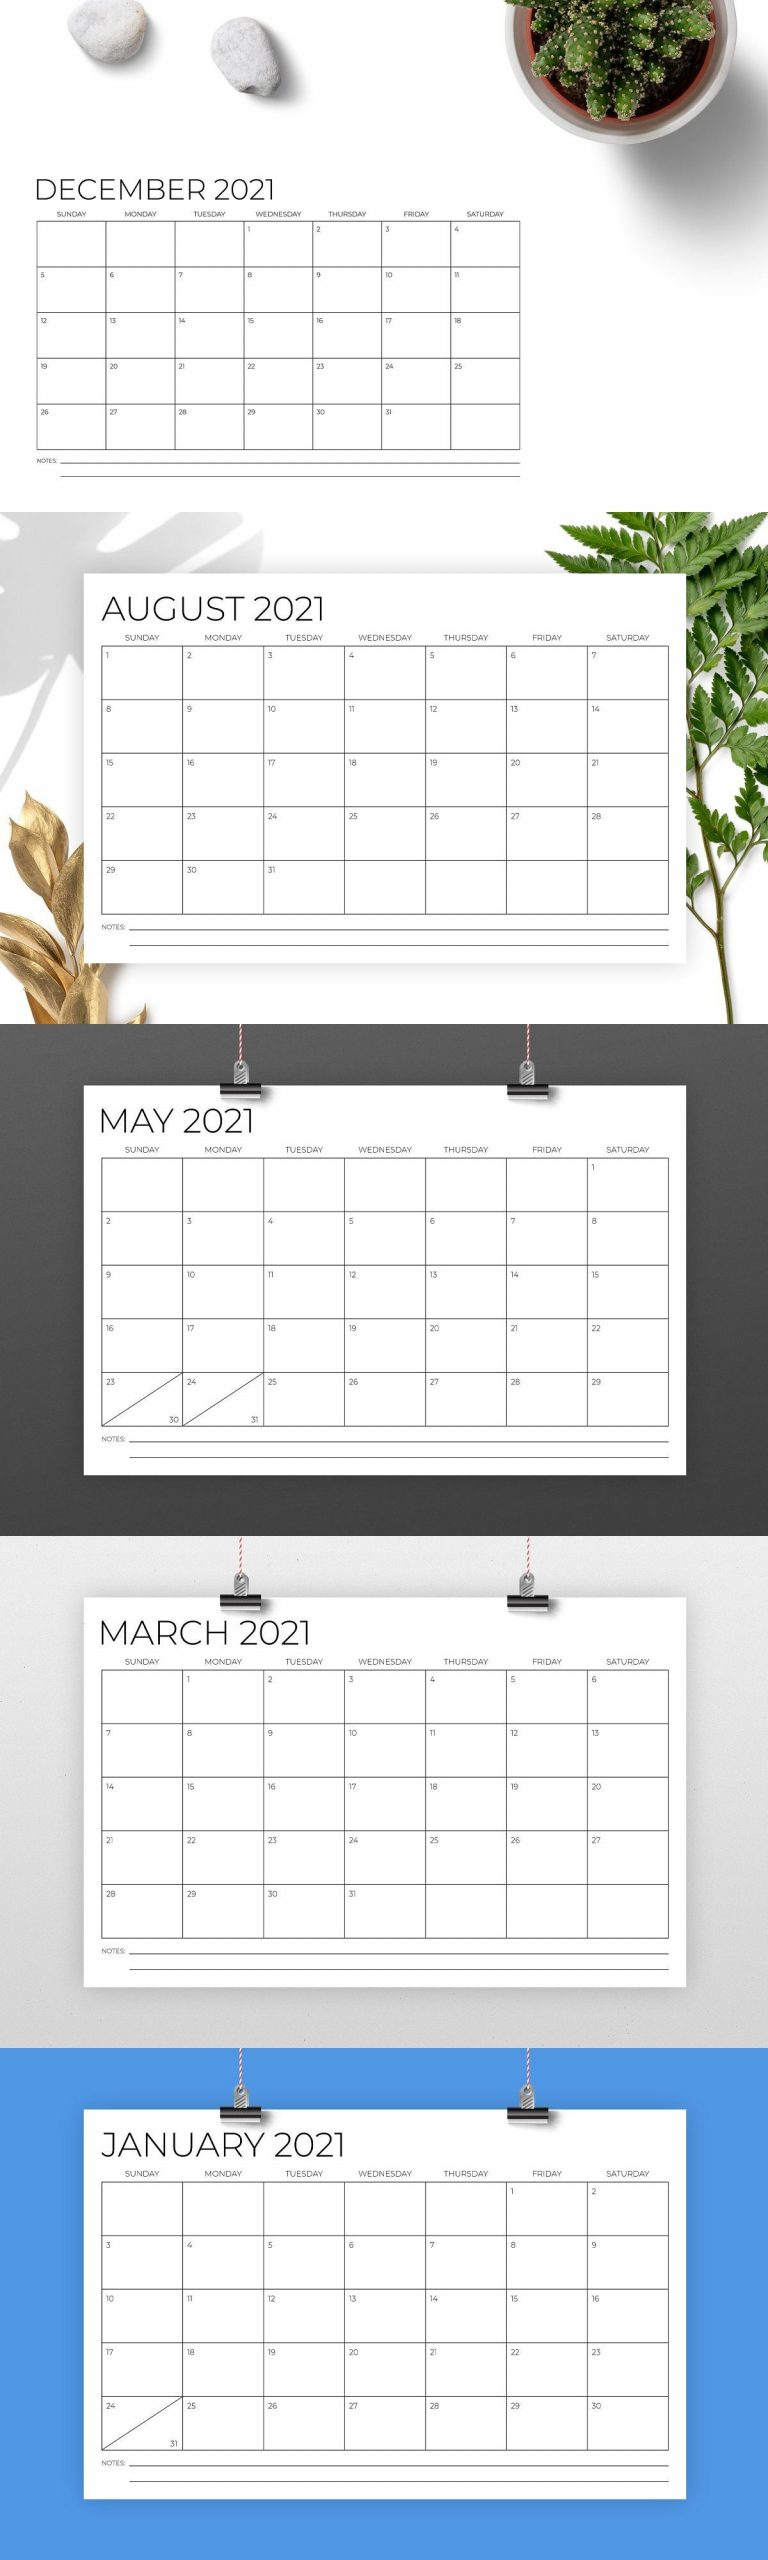 11 X 17 Inch Modern 2021 Calendar In 2020 2021 Calendar 1